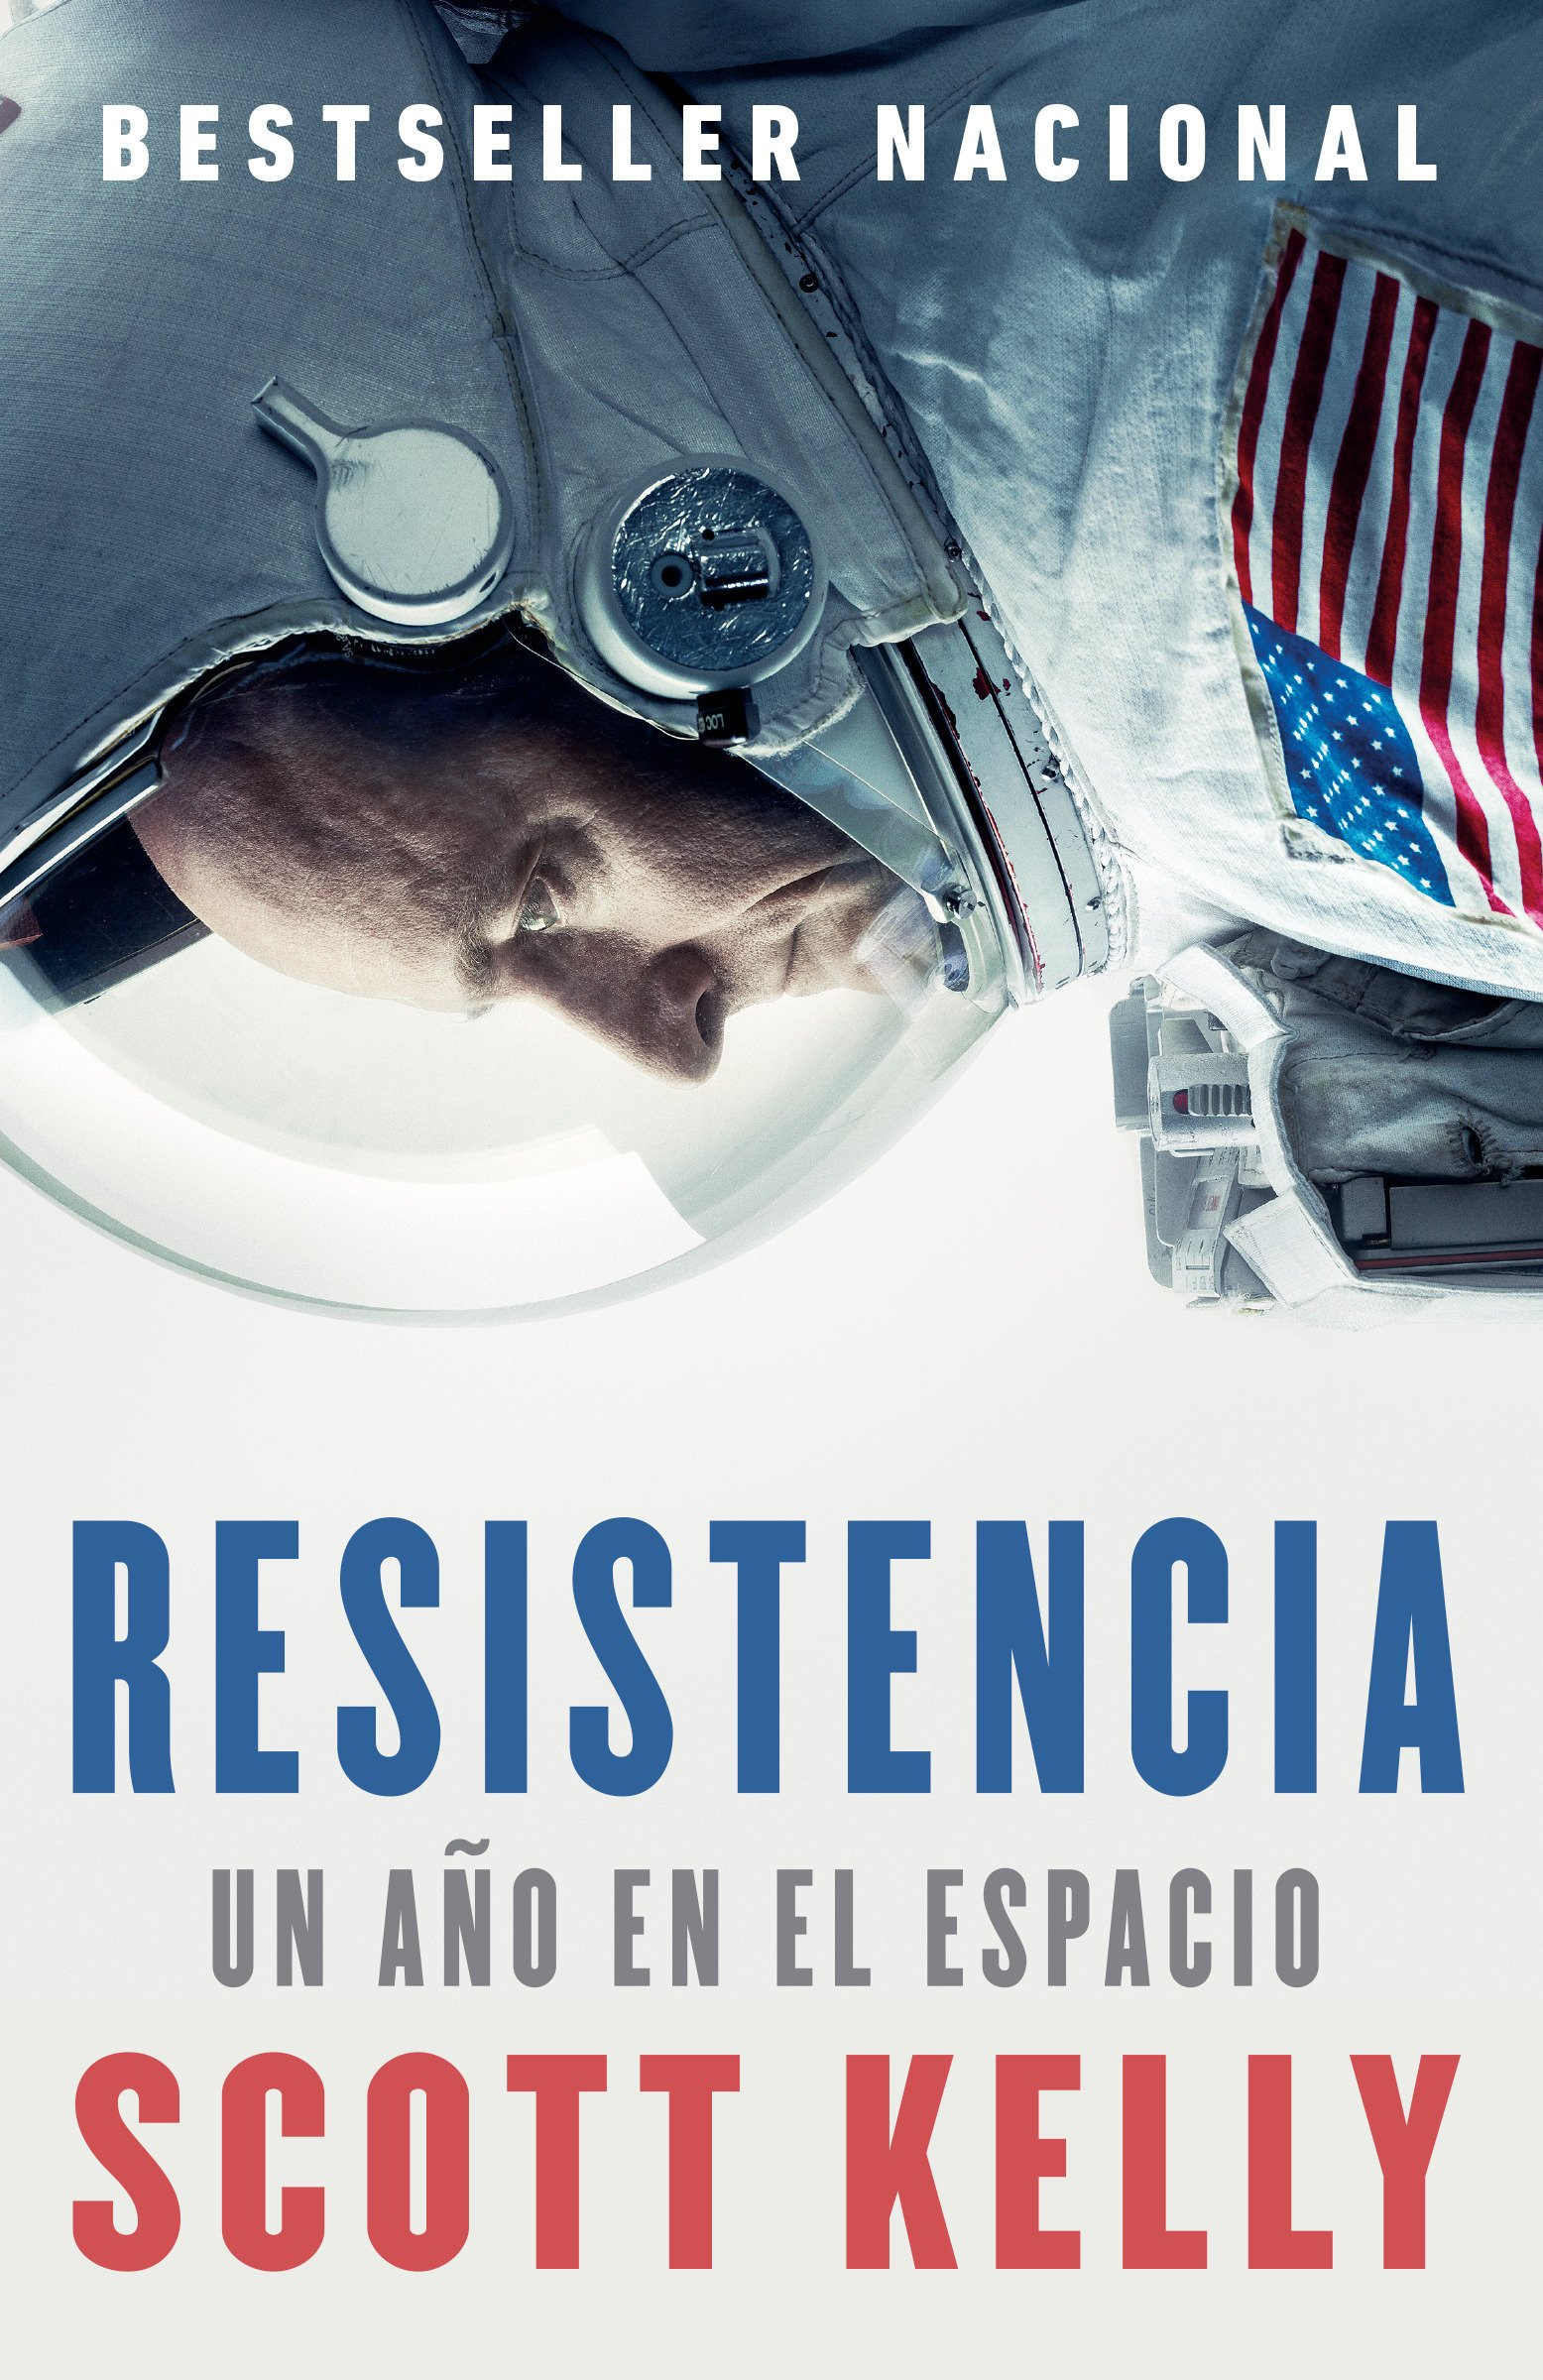 Resistencia: Spanish-language edition of Endurance (Spanish Edition) by Vintage Espanol